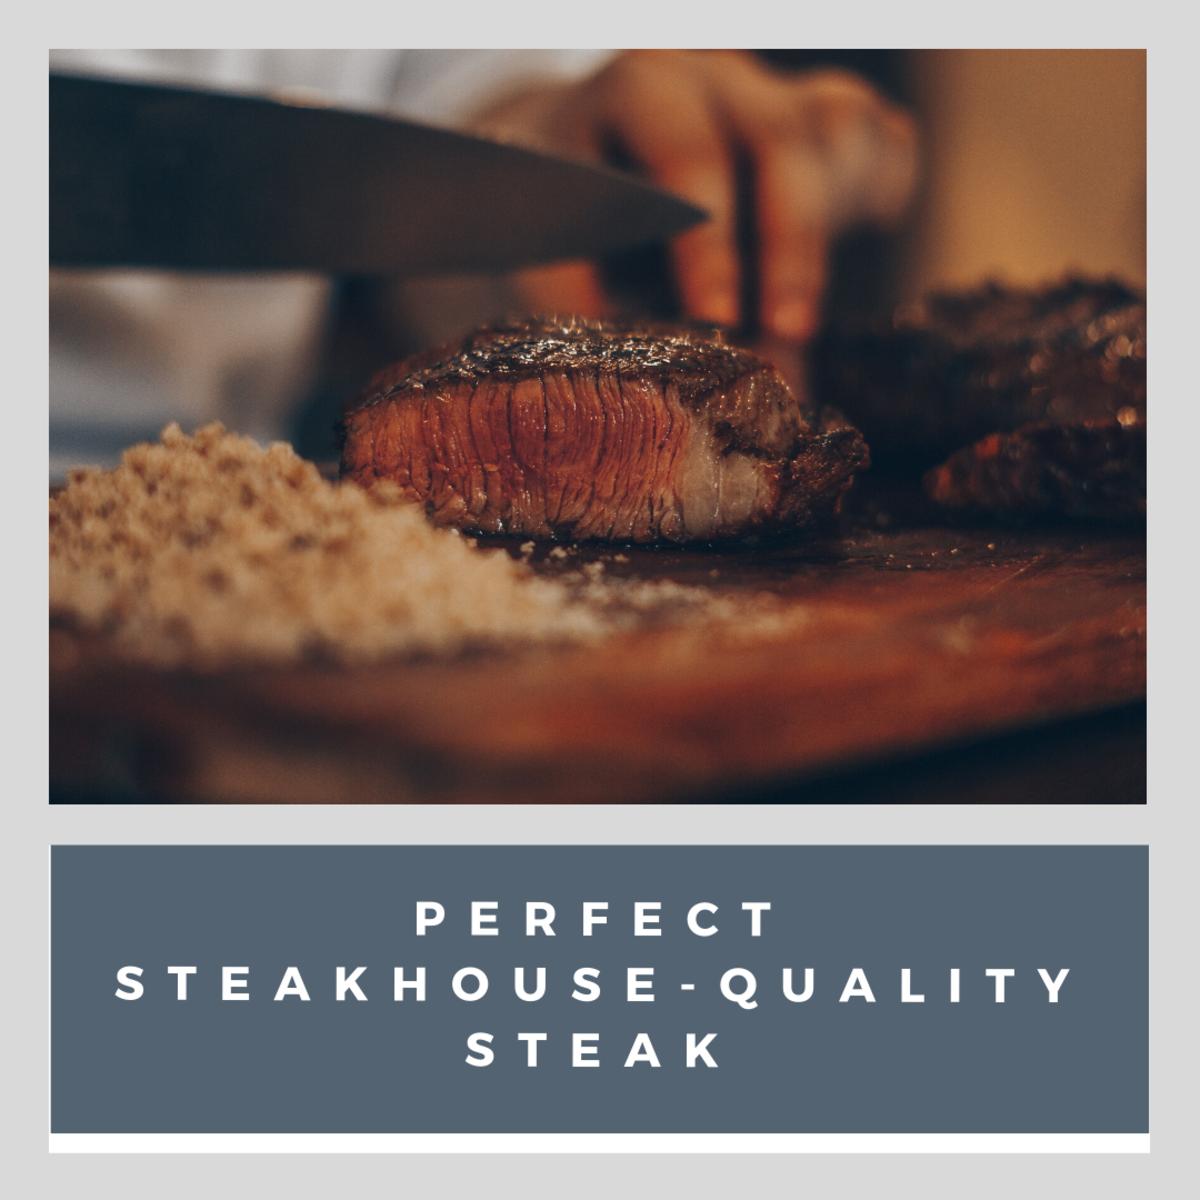 Crusty, brown, seared steak. Perfect.